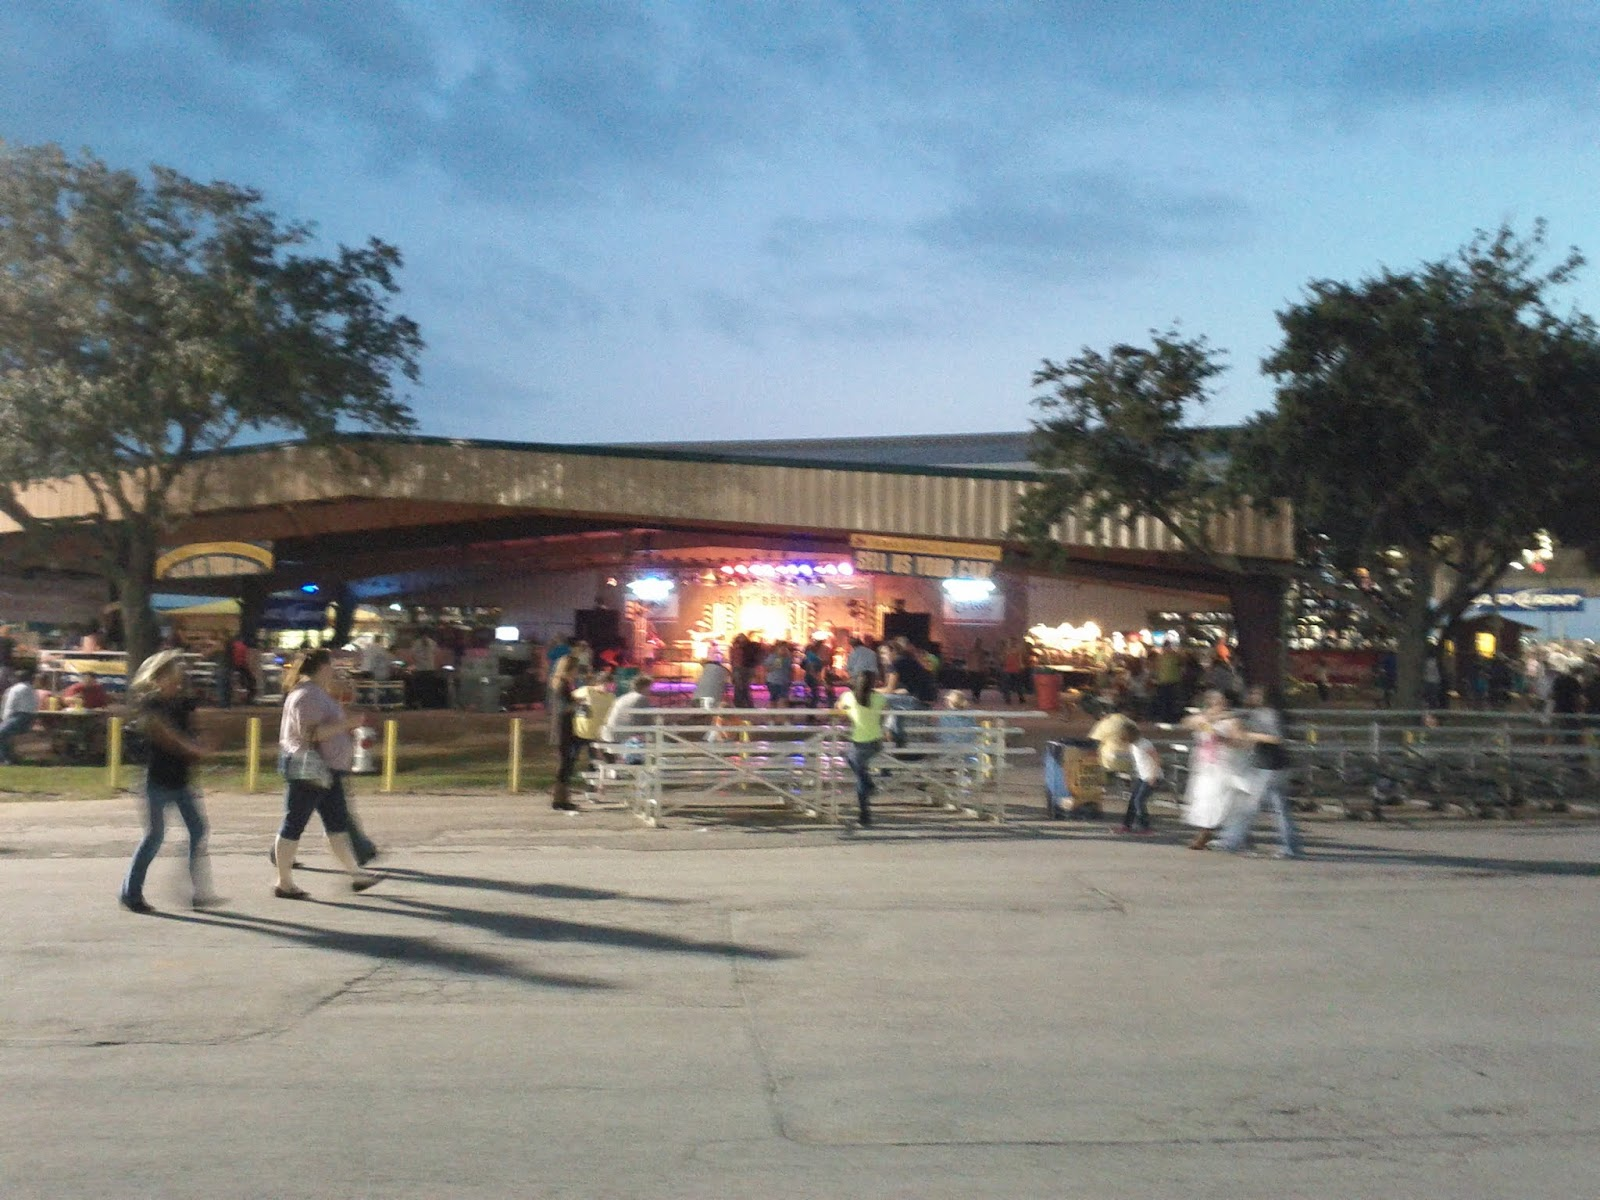 Fort Bend County Fair 2012 - IMG_20121006_191857.jpg